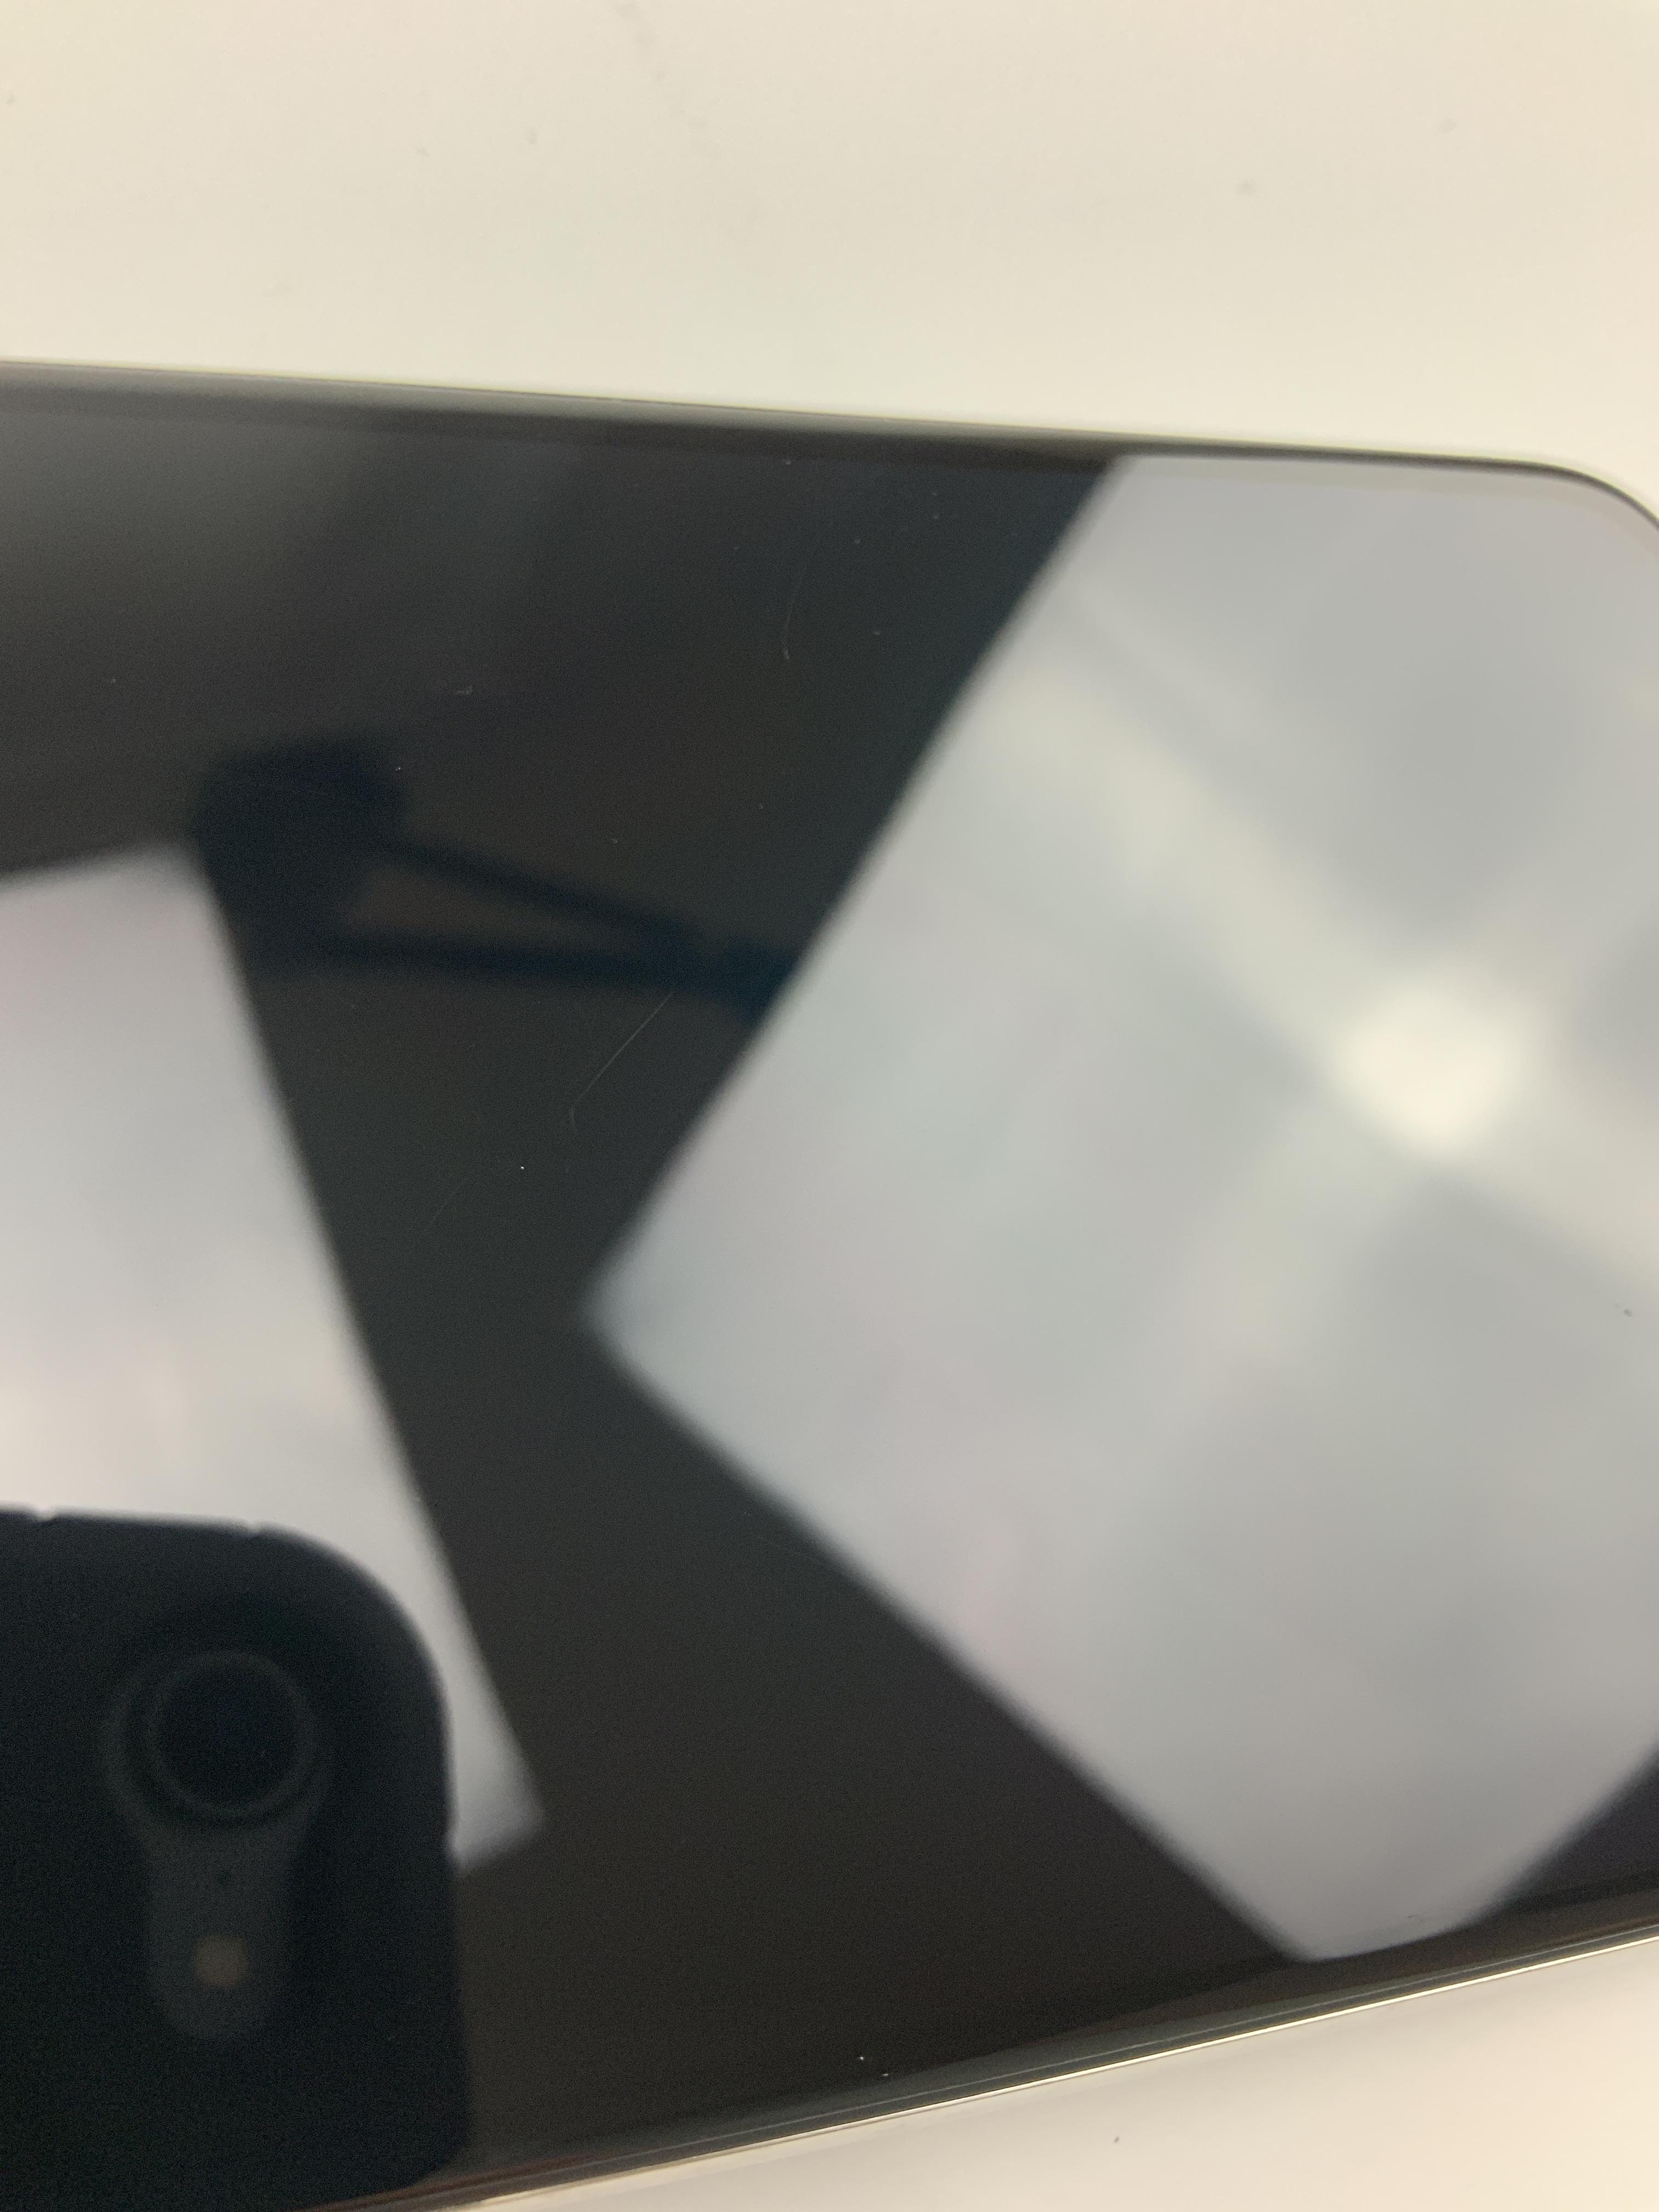 iPhone XS Max 64GB, 64GB, Silver, immagine 3